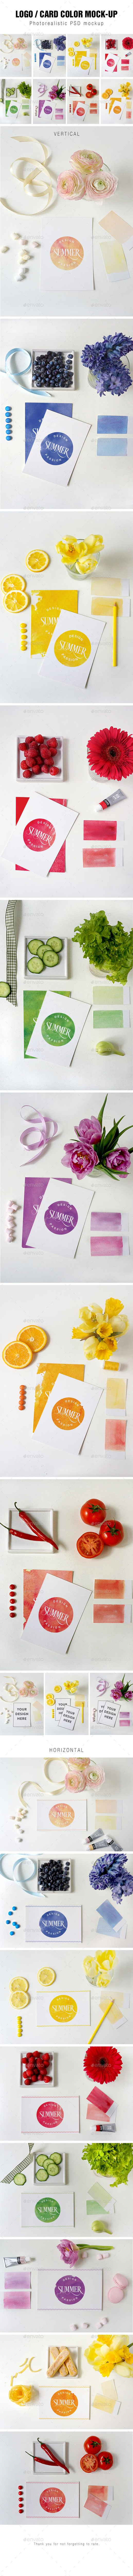 GraphicRiver Logo Card Color Mockup 11261154